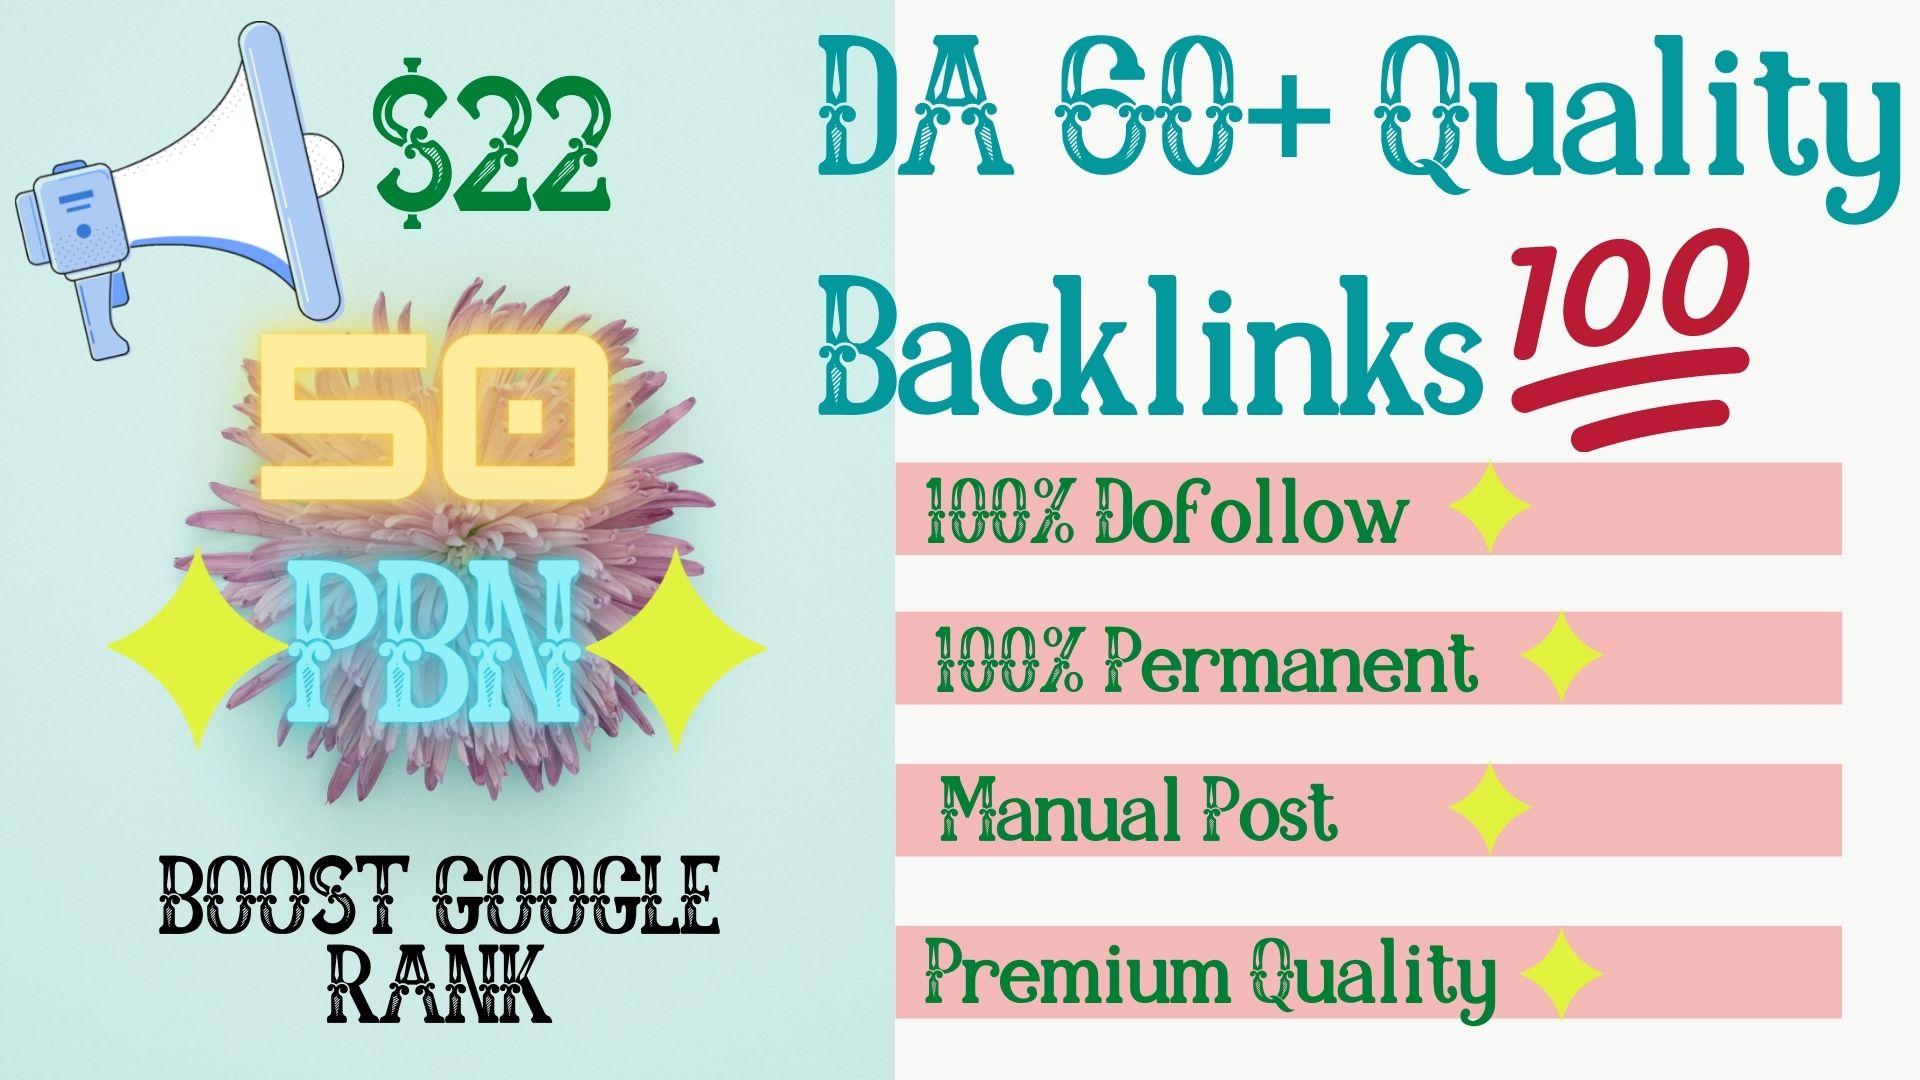 Get 50 High Quality DA 60+ Permanent HomePage Dofollow PBN Links.